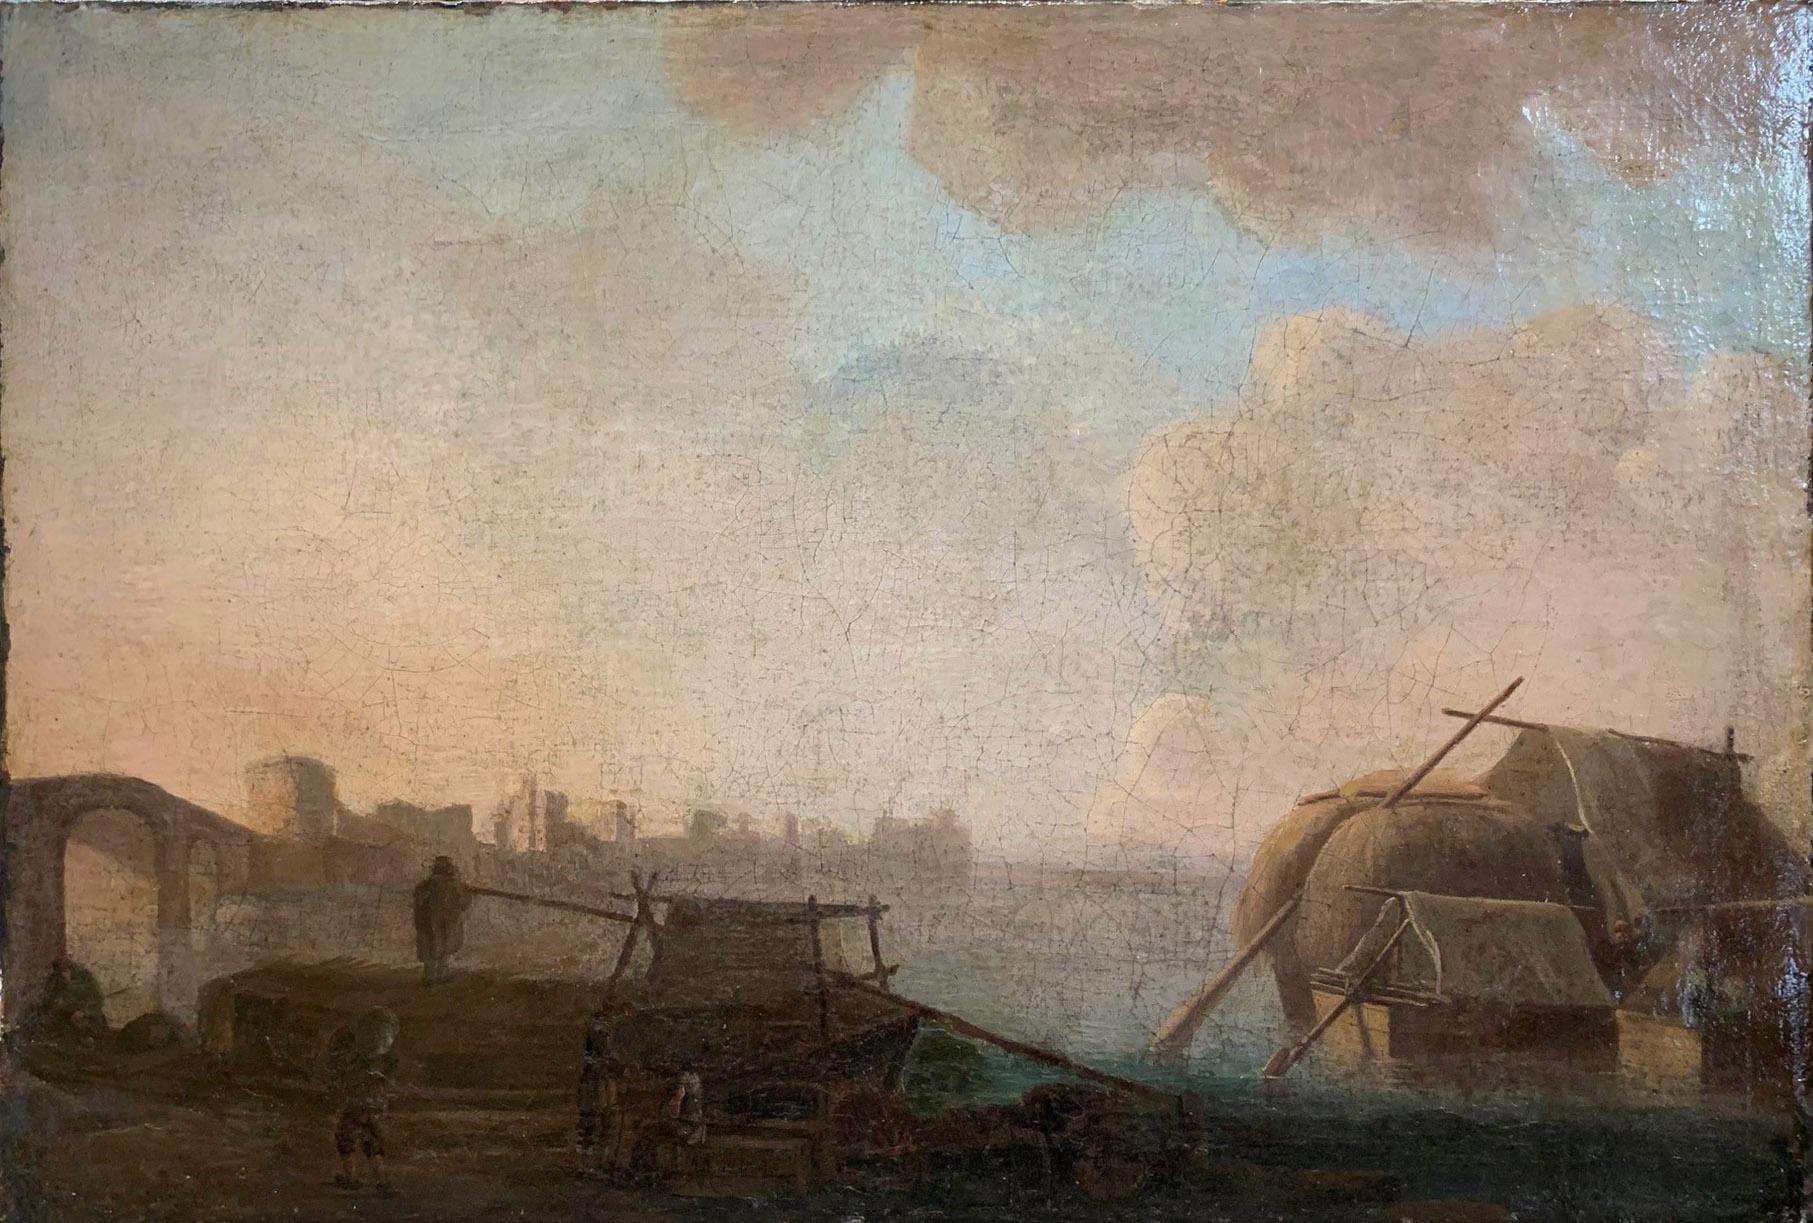 CIRCLE OF JAN VAN GOYEN, LEIDEN, 1596 - 1656, THE HAGUE, 17TH CENTURY OIL ON CANVAS River landscape,